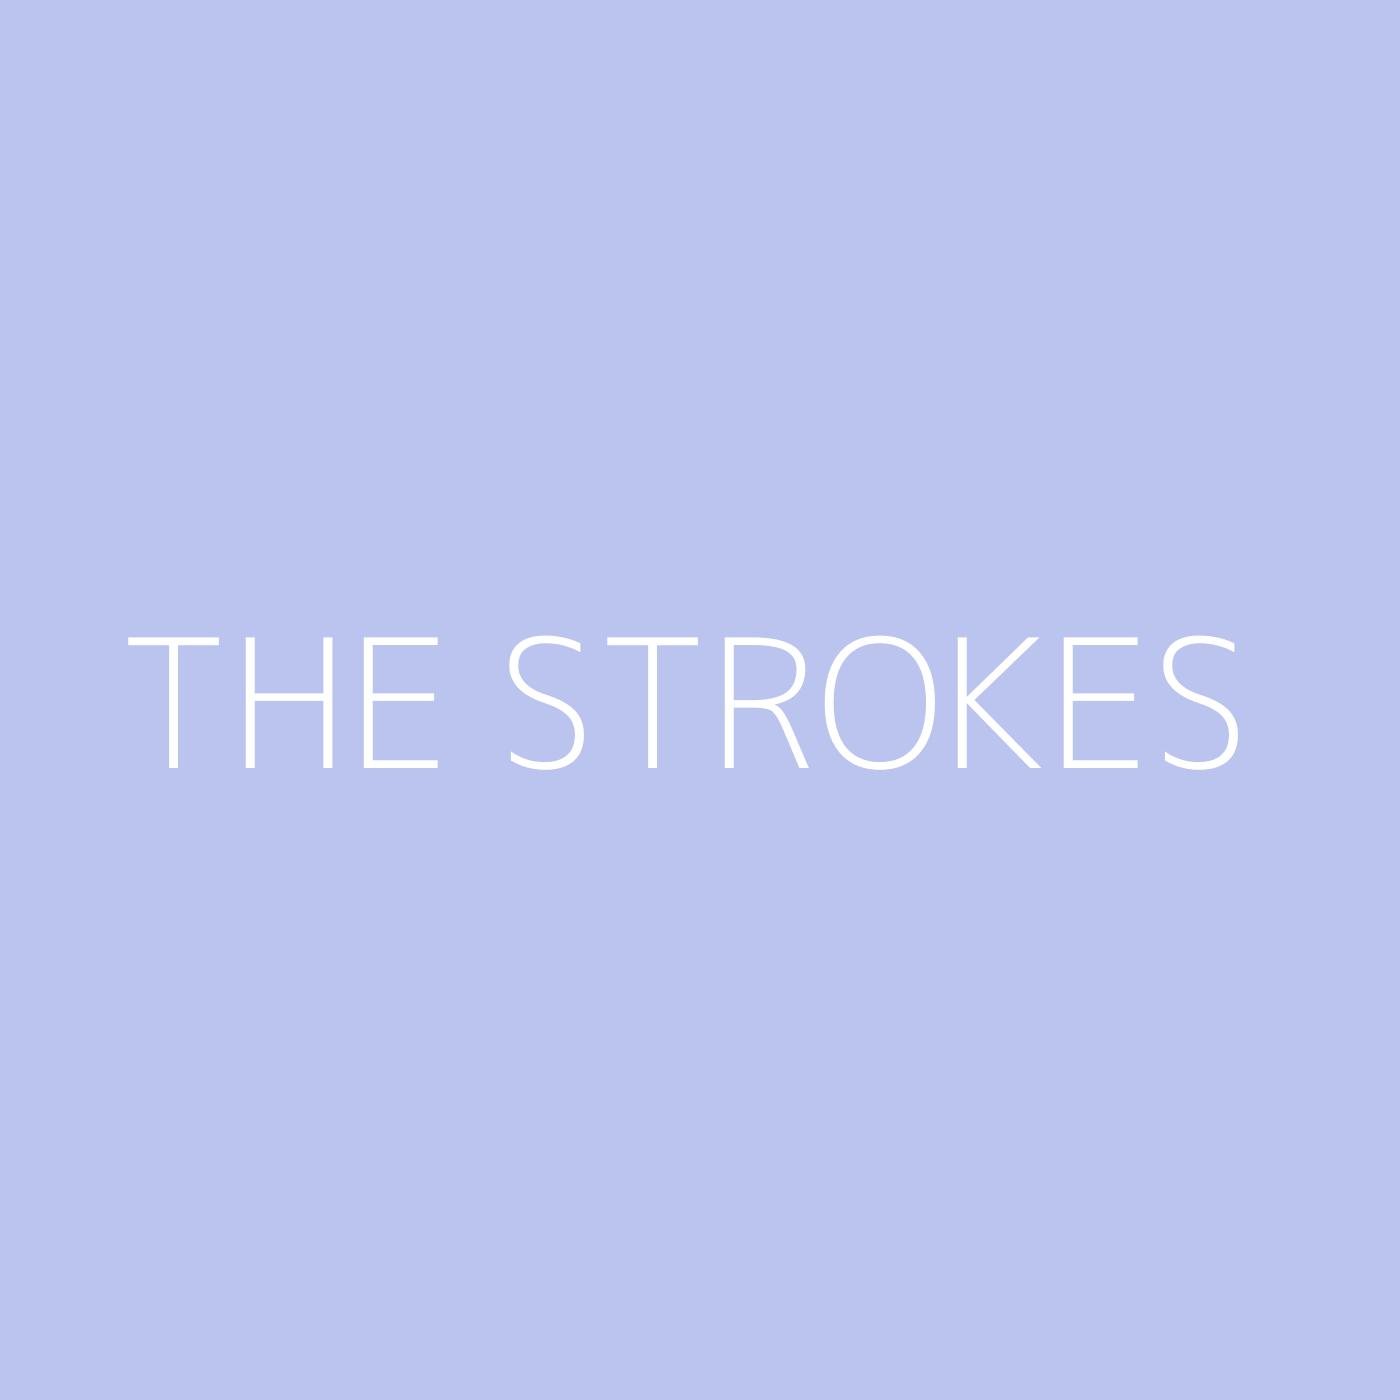 The Strokes Playlist Artwork